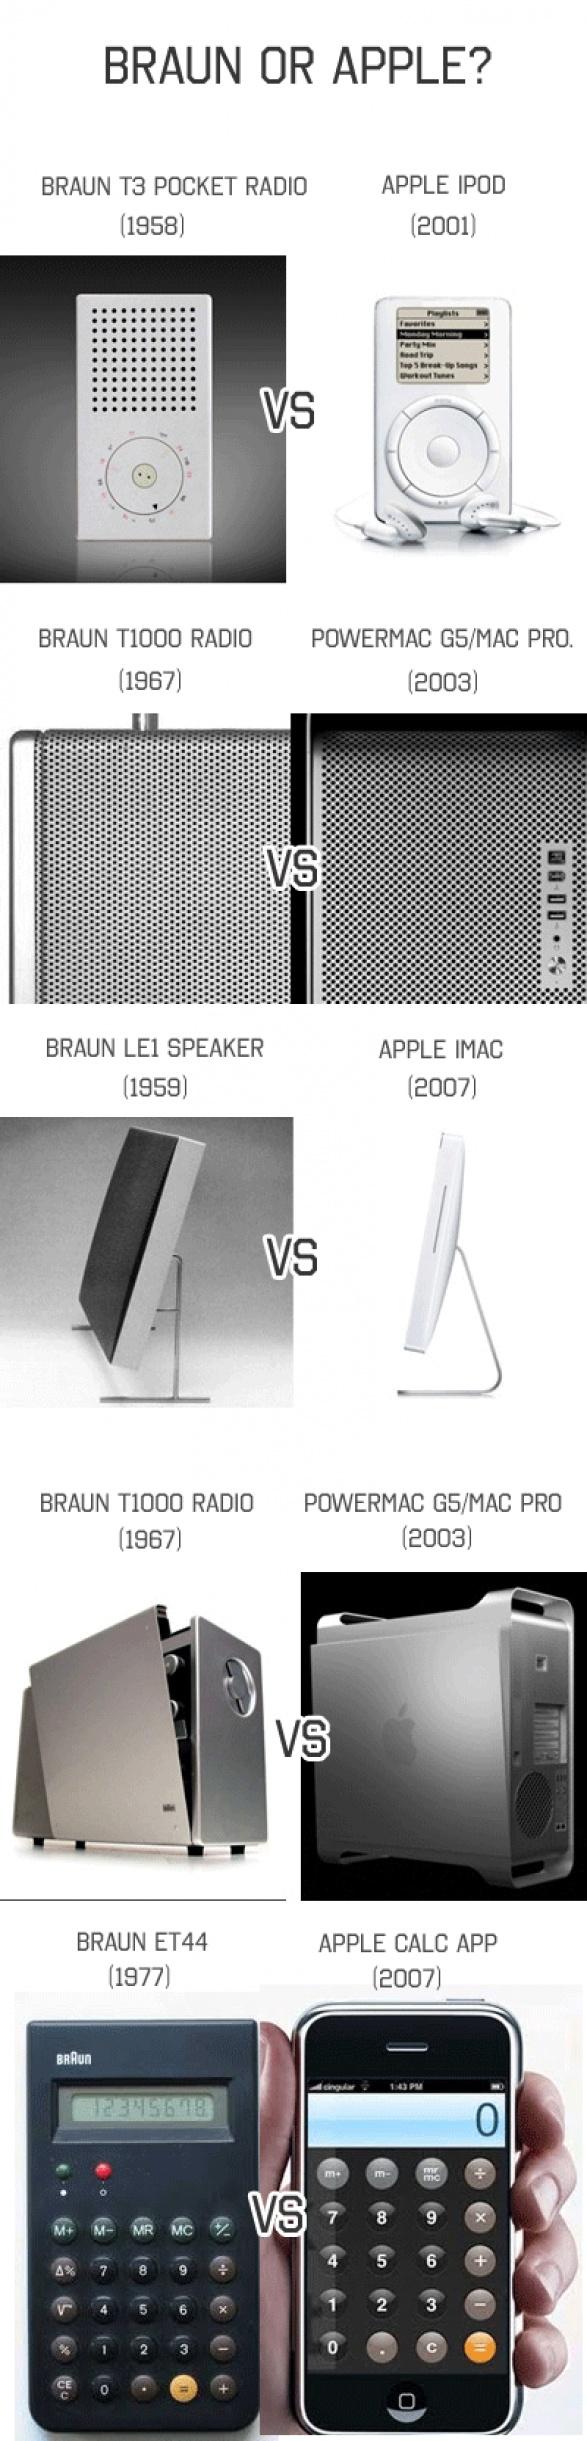 ★ Braun or Apple? | Actual product designer Jonathan Ive (Apple) inspired by product designer Dieter Rams (50ies-90ies for Braun)